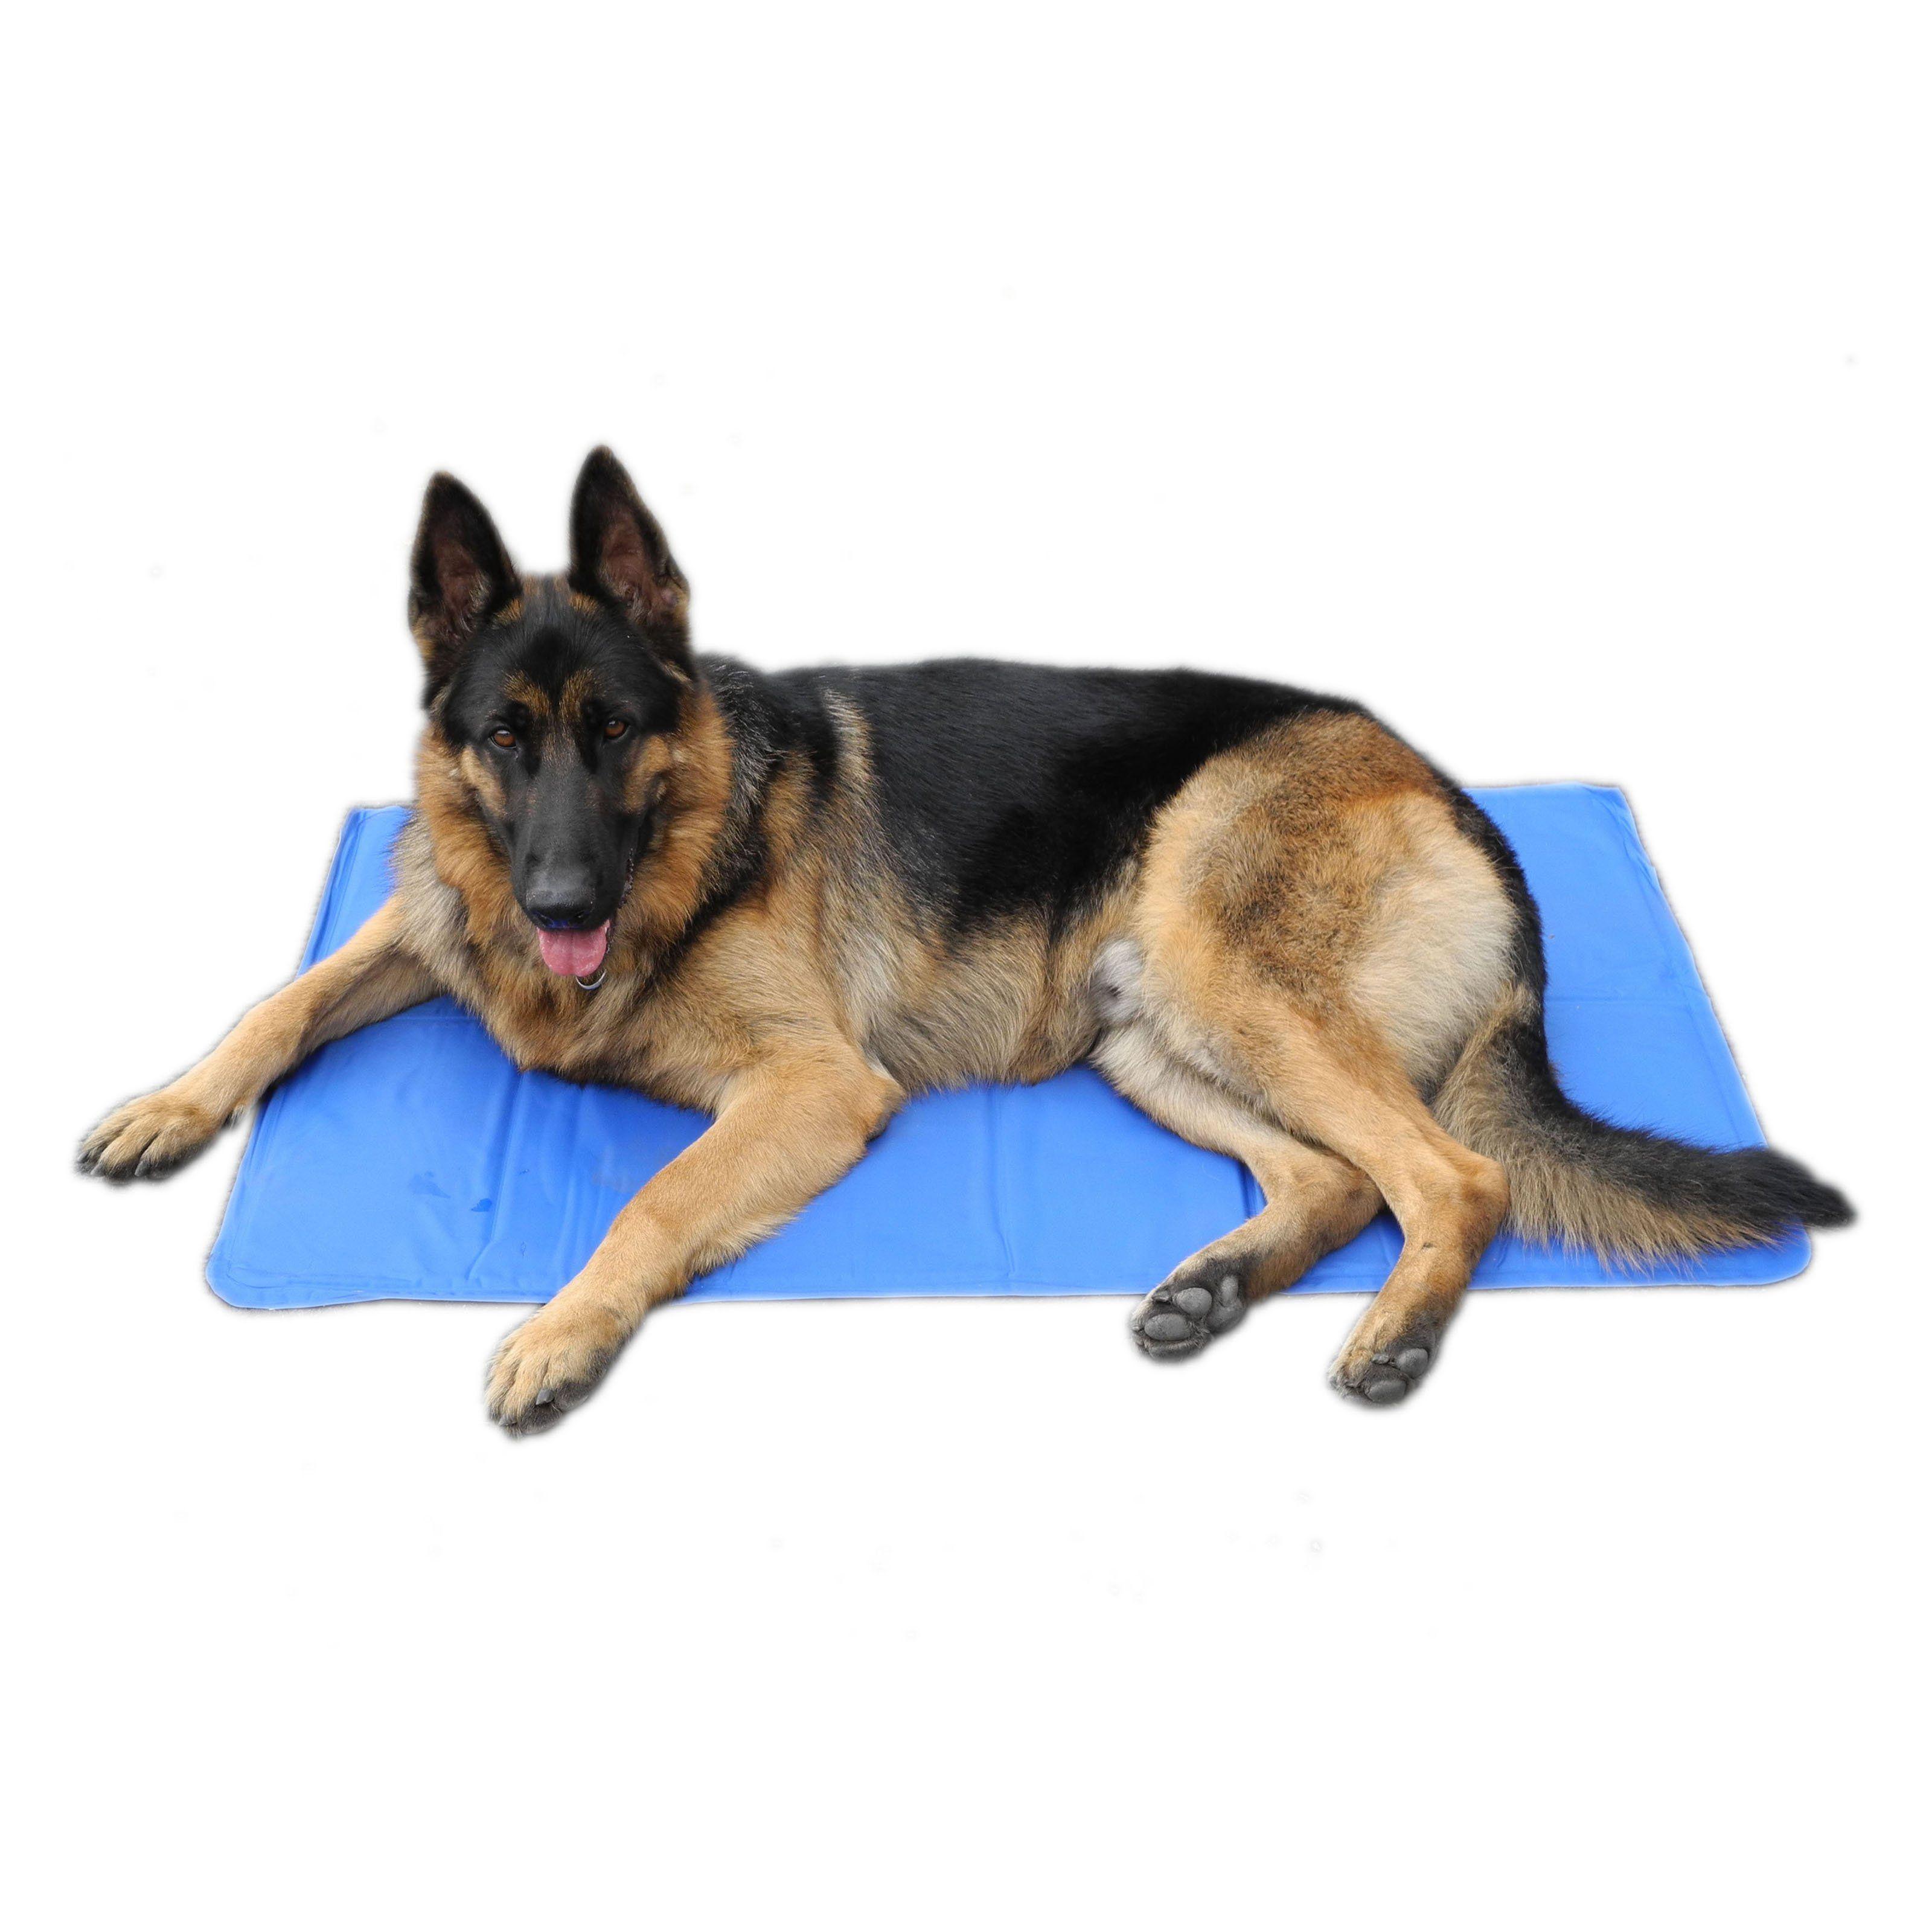 Go Pet Club Pet Cooling Gel Pad Gpc8020 With Images Pet Cooling Mat Pets Dog Bed Mat